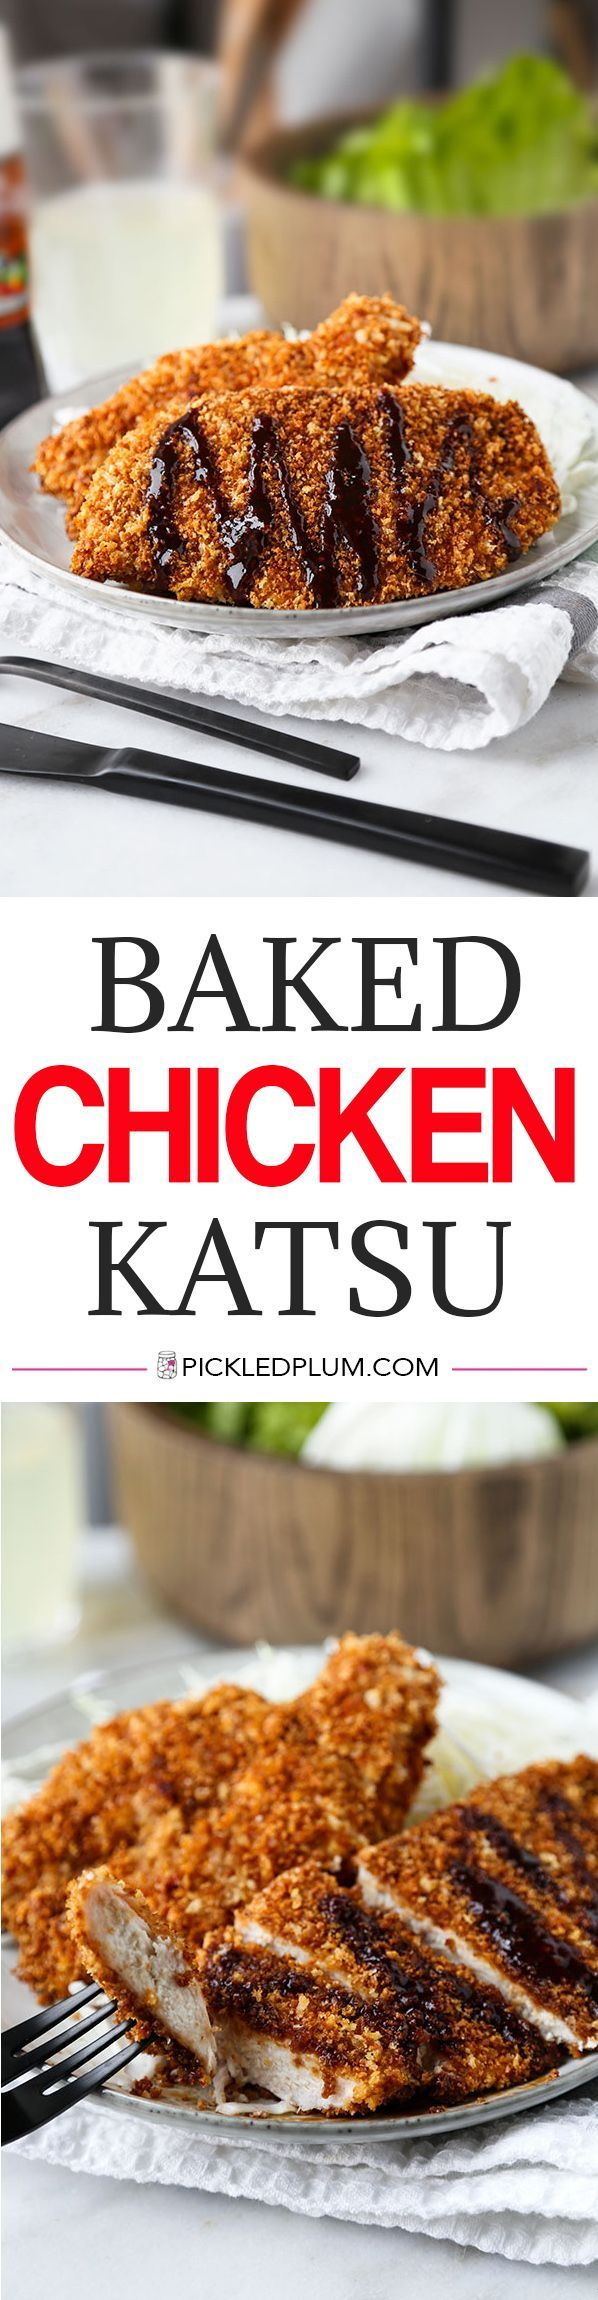 Baked Chicken Katsu - Not only is this baked chicken katsu recipe just as crispy as the deep fried version, it stays crispy even longer! Recipe, chicken, dinner, healthy, bake | pickledplum.com